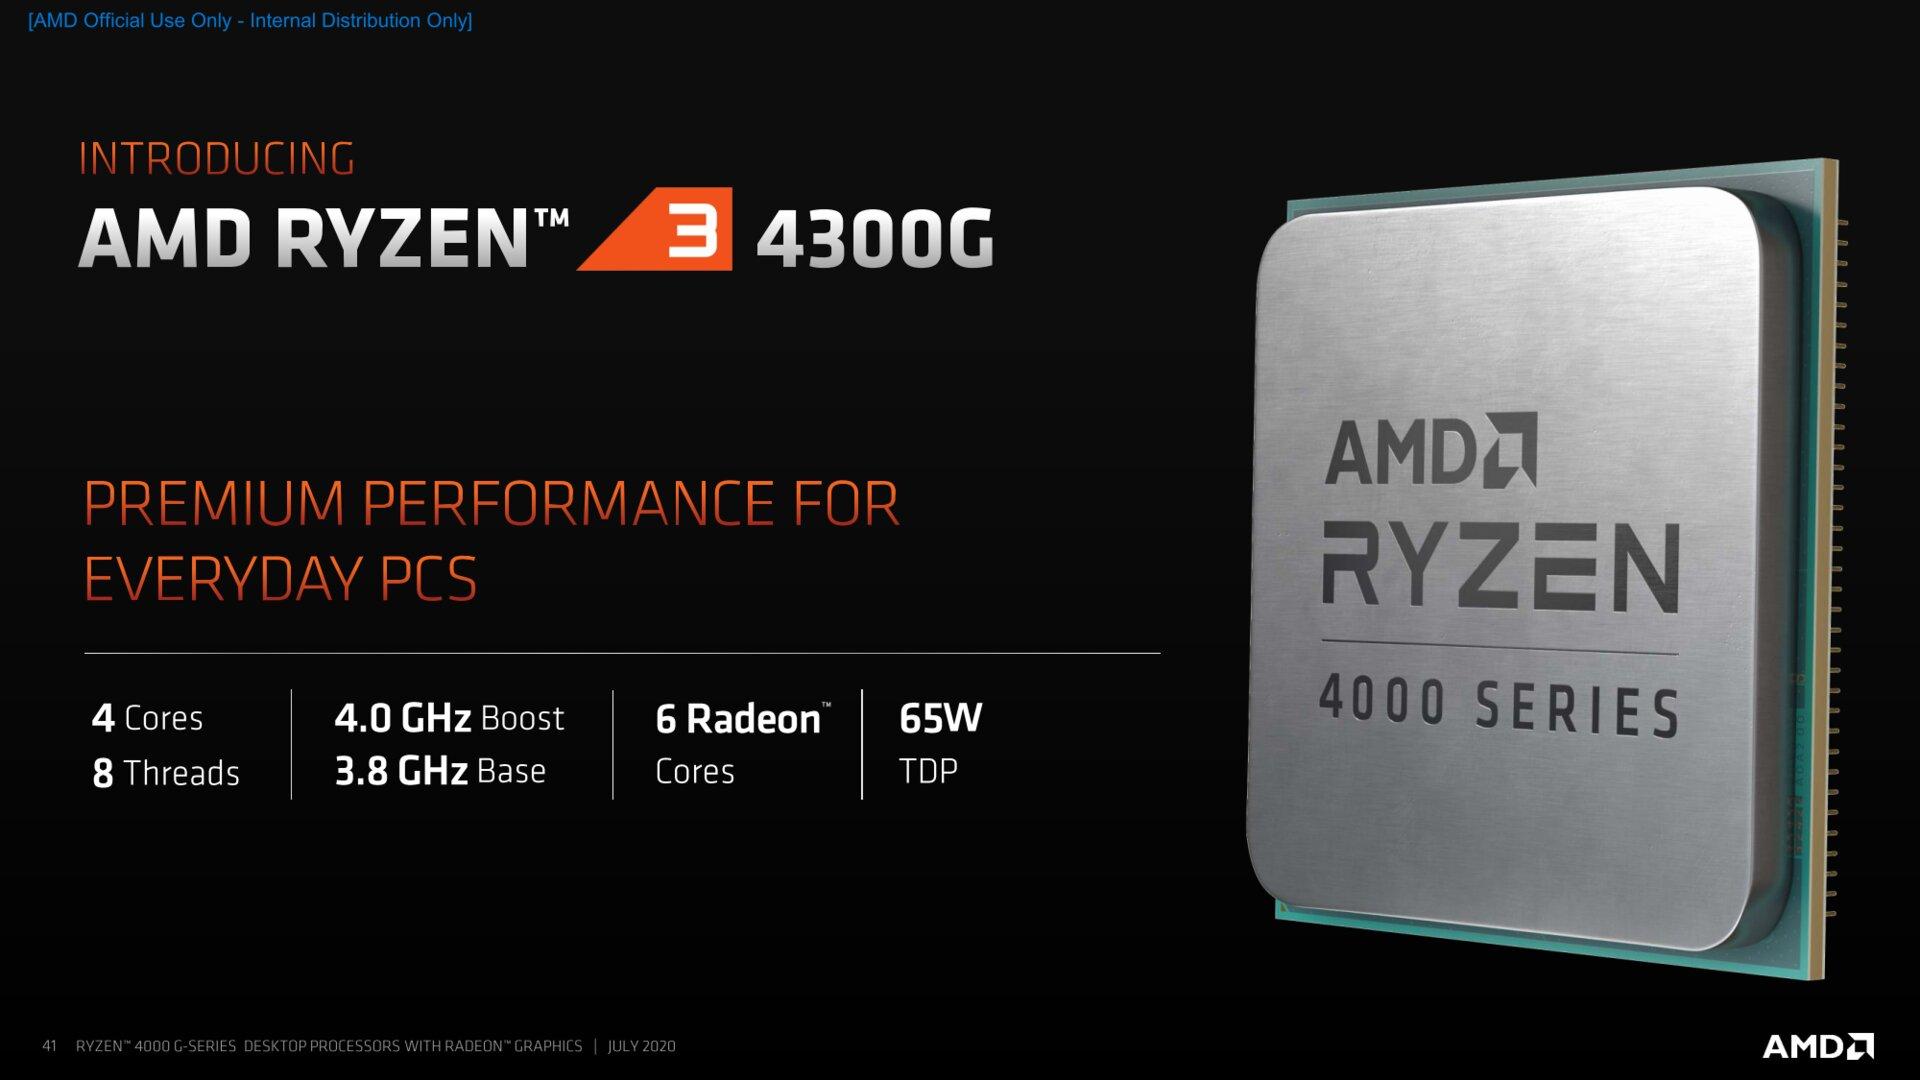 Ryzen 3 4300G